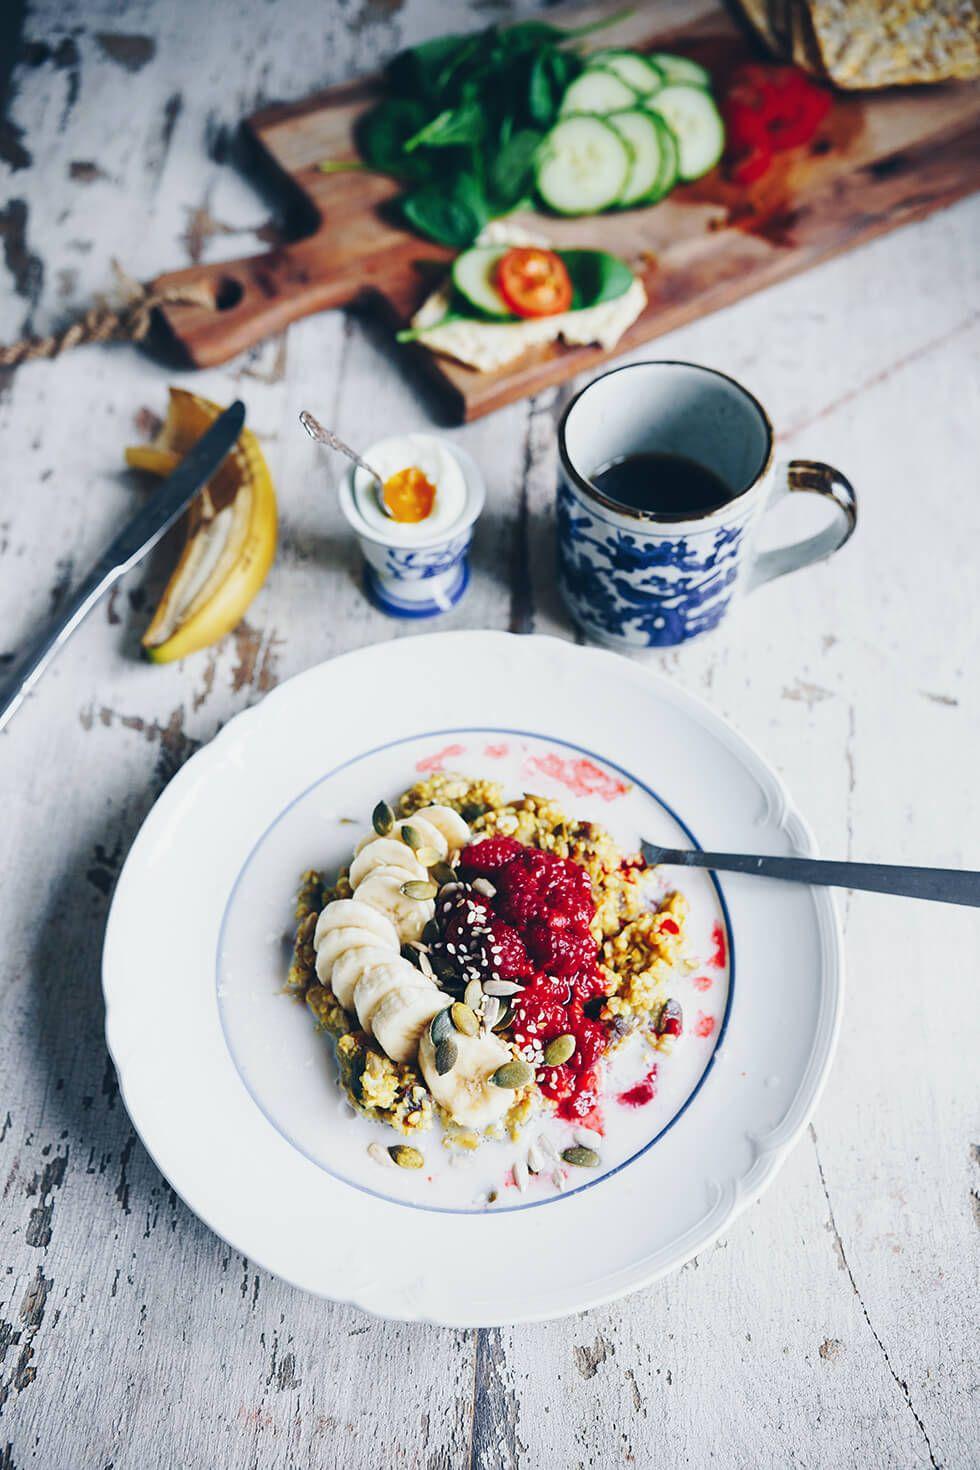 Gyllene bovetegröt, naturligt glutenfri hälsosam frukost